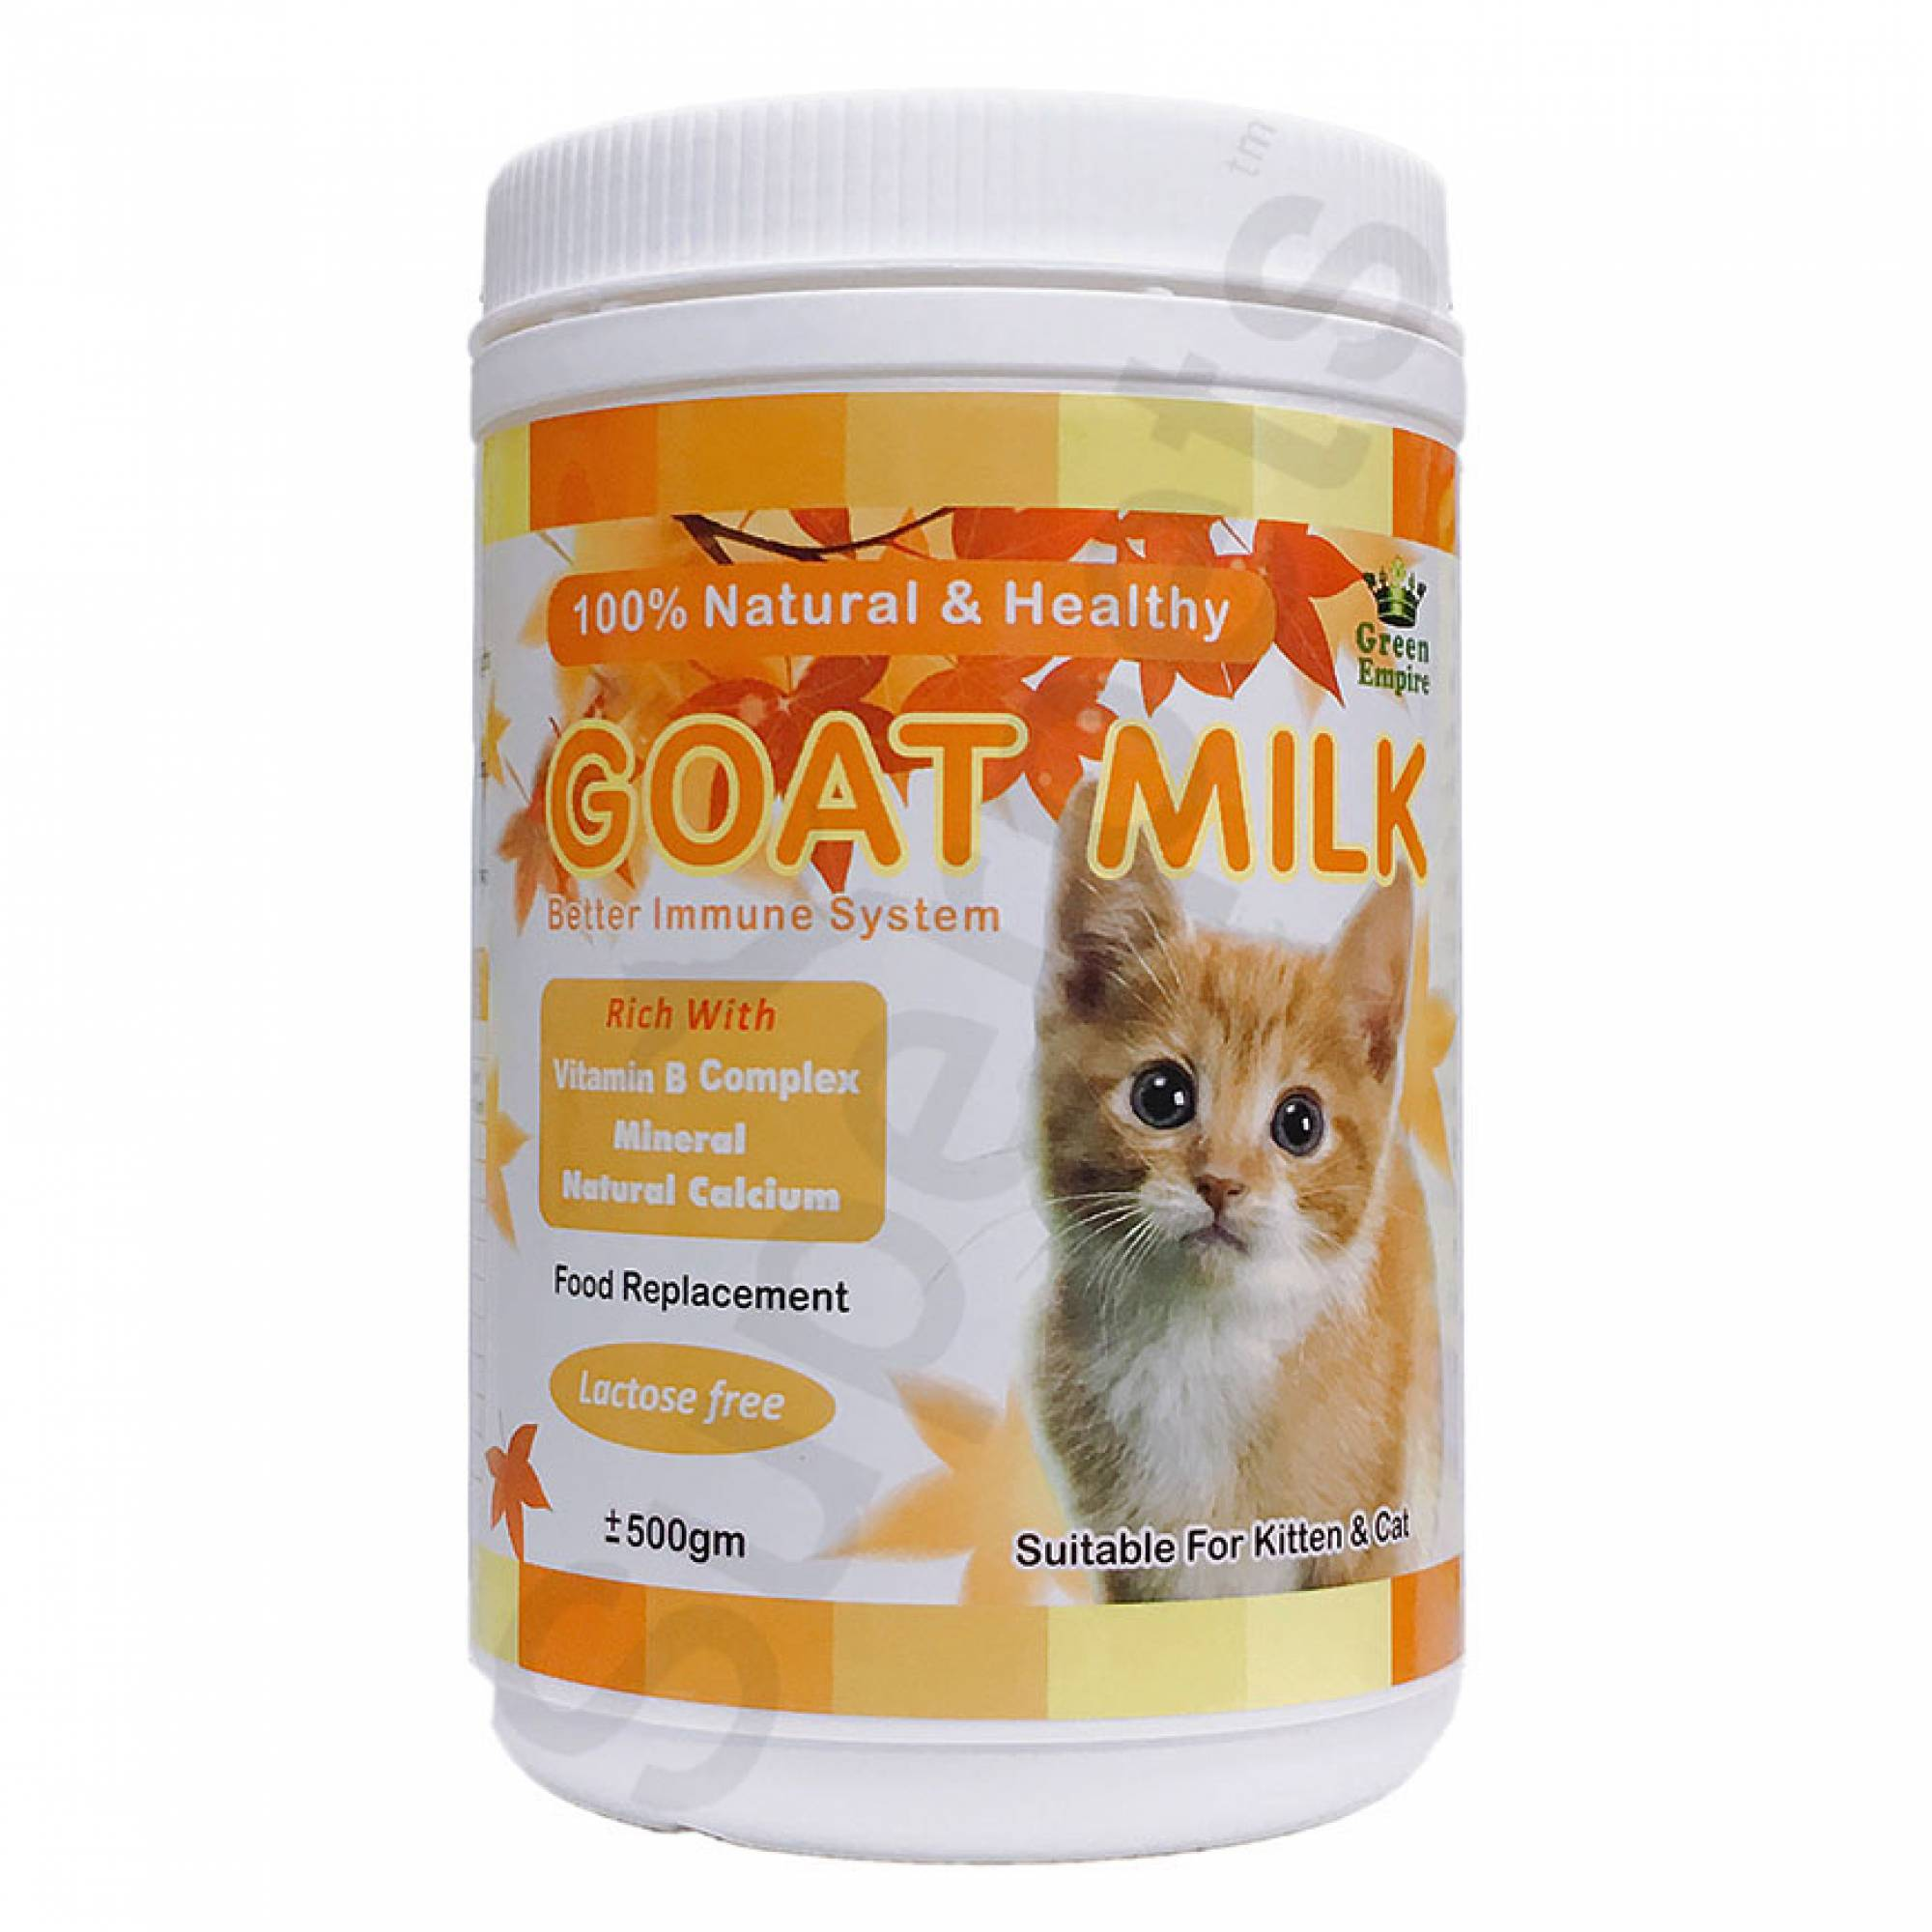 Green Empire Goat Milk Powder for Kitten and Cat 500g